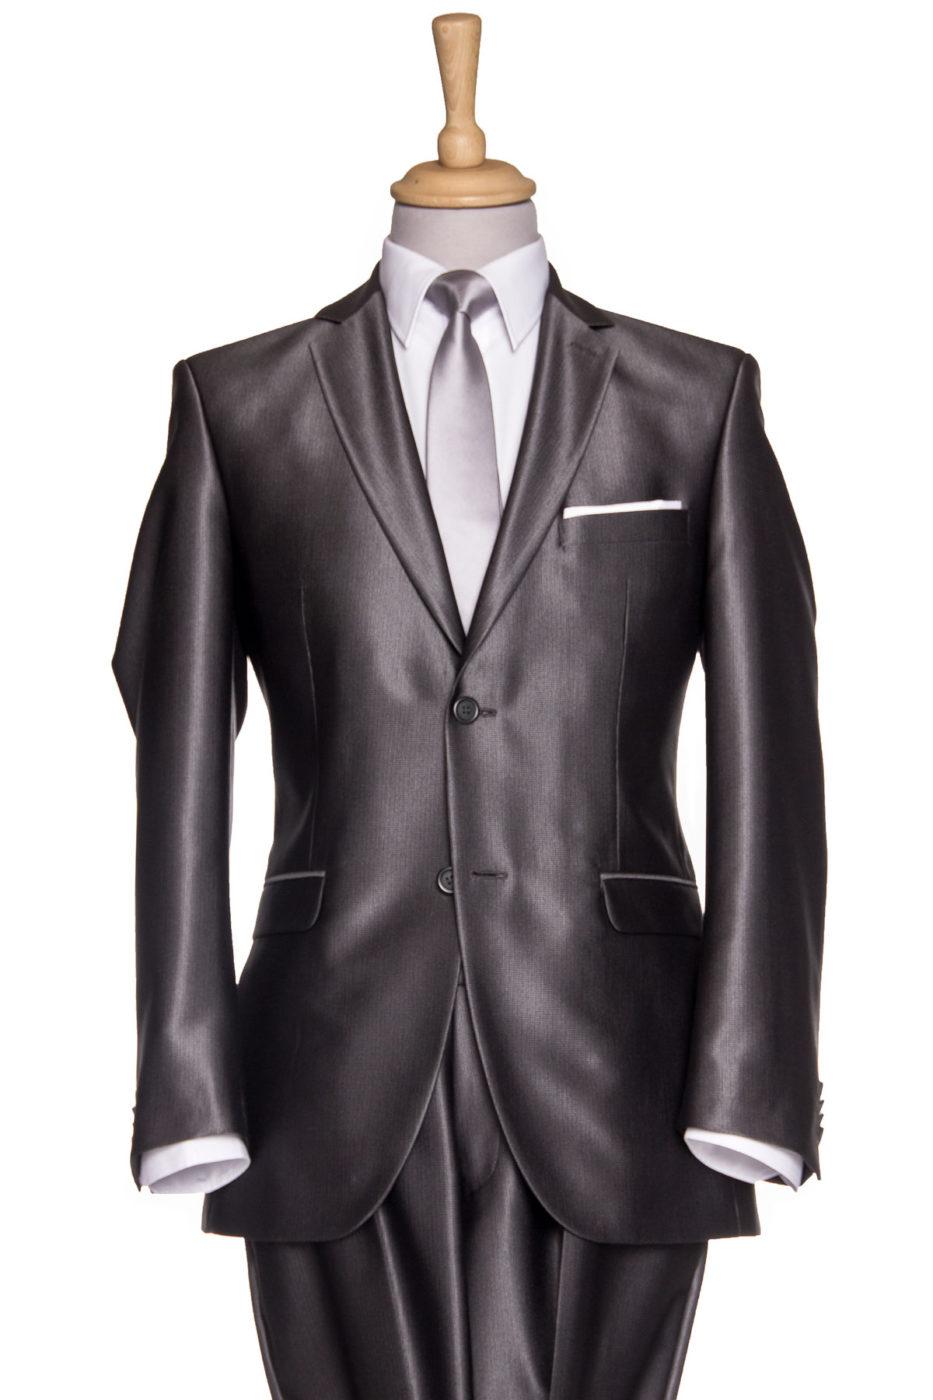 Barcelona Grey Suit